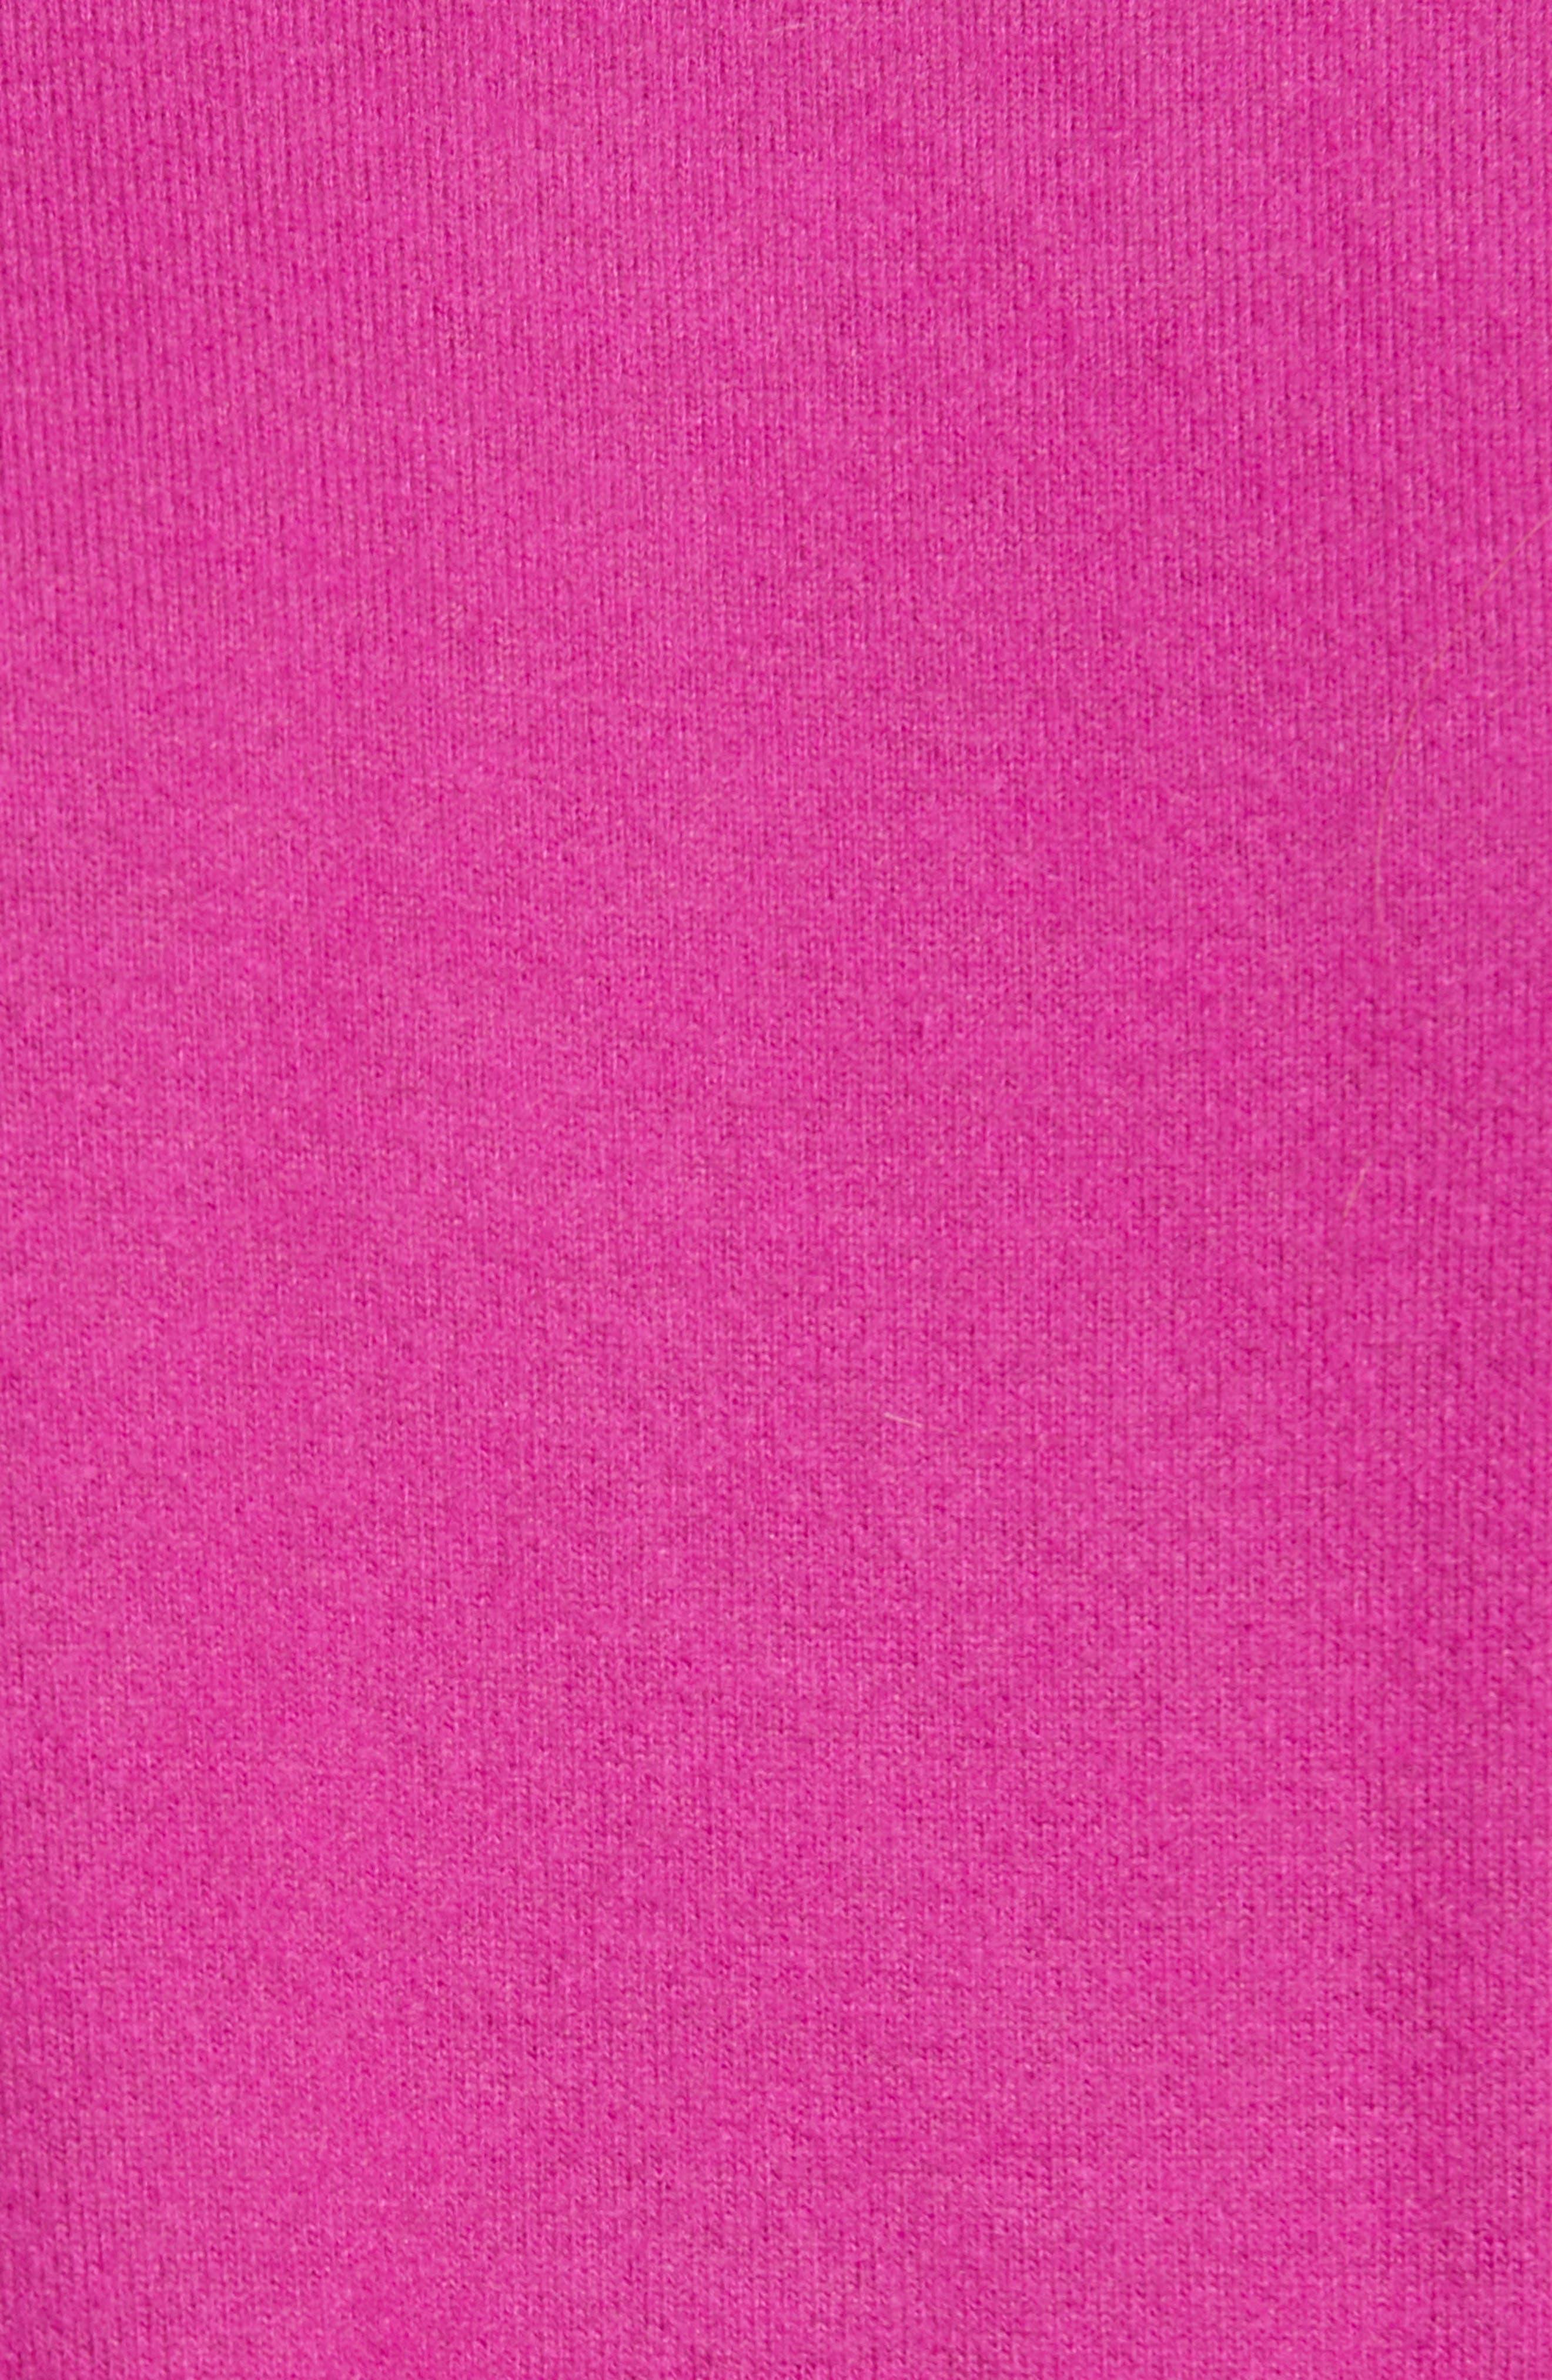 Cozy Twist Front Pullover,                             Alternate thumbnail 5, color,                             PURPLE VINTER SOLID